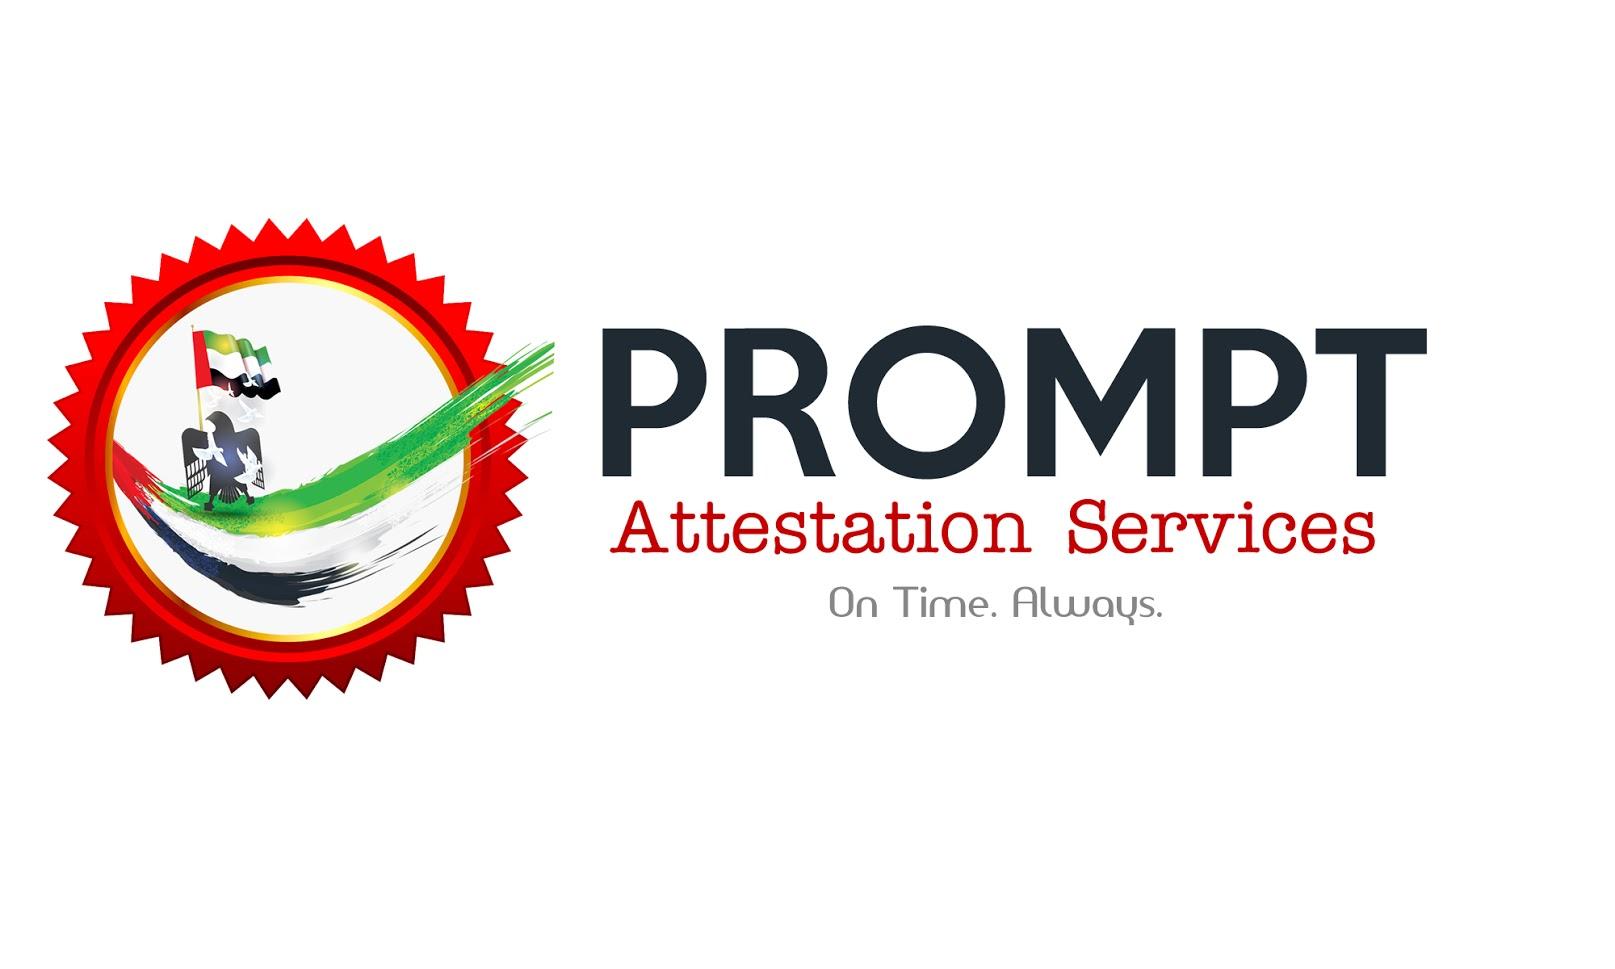 Prompt Attestation Services